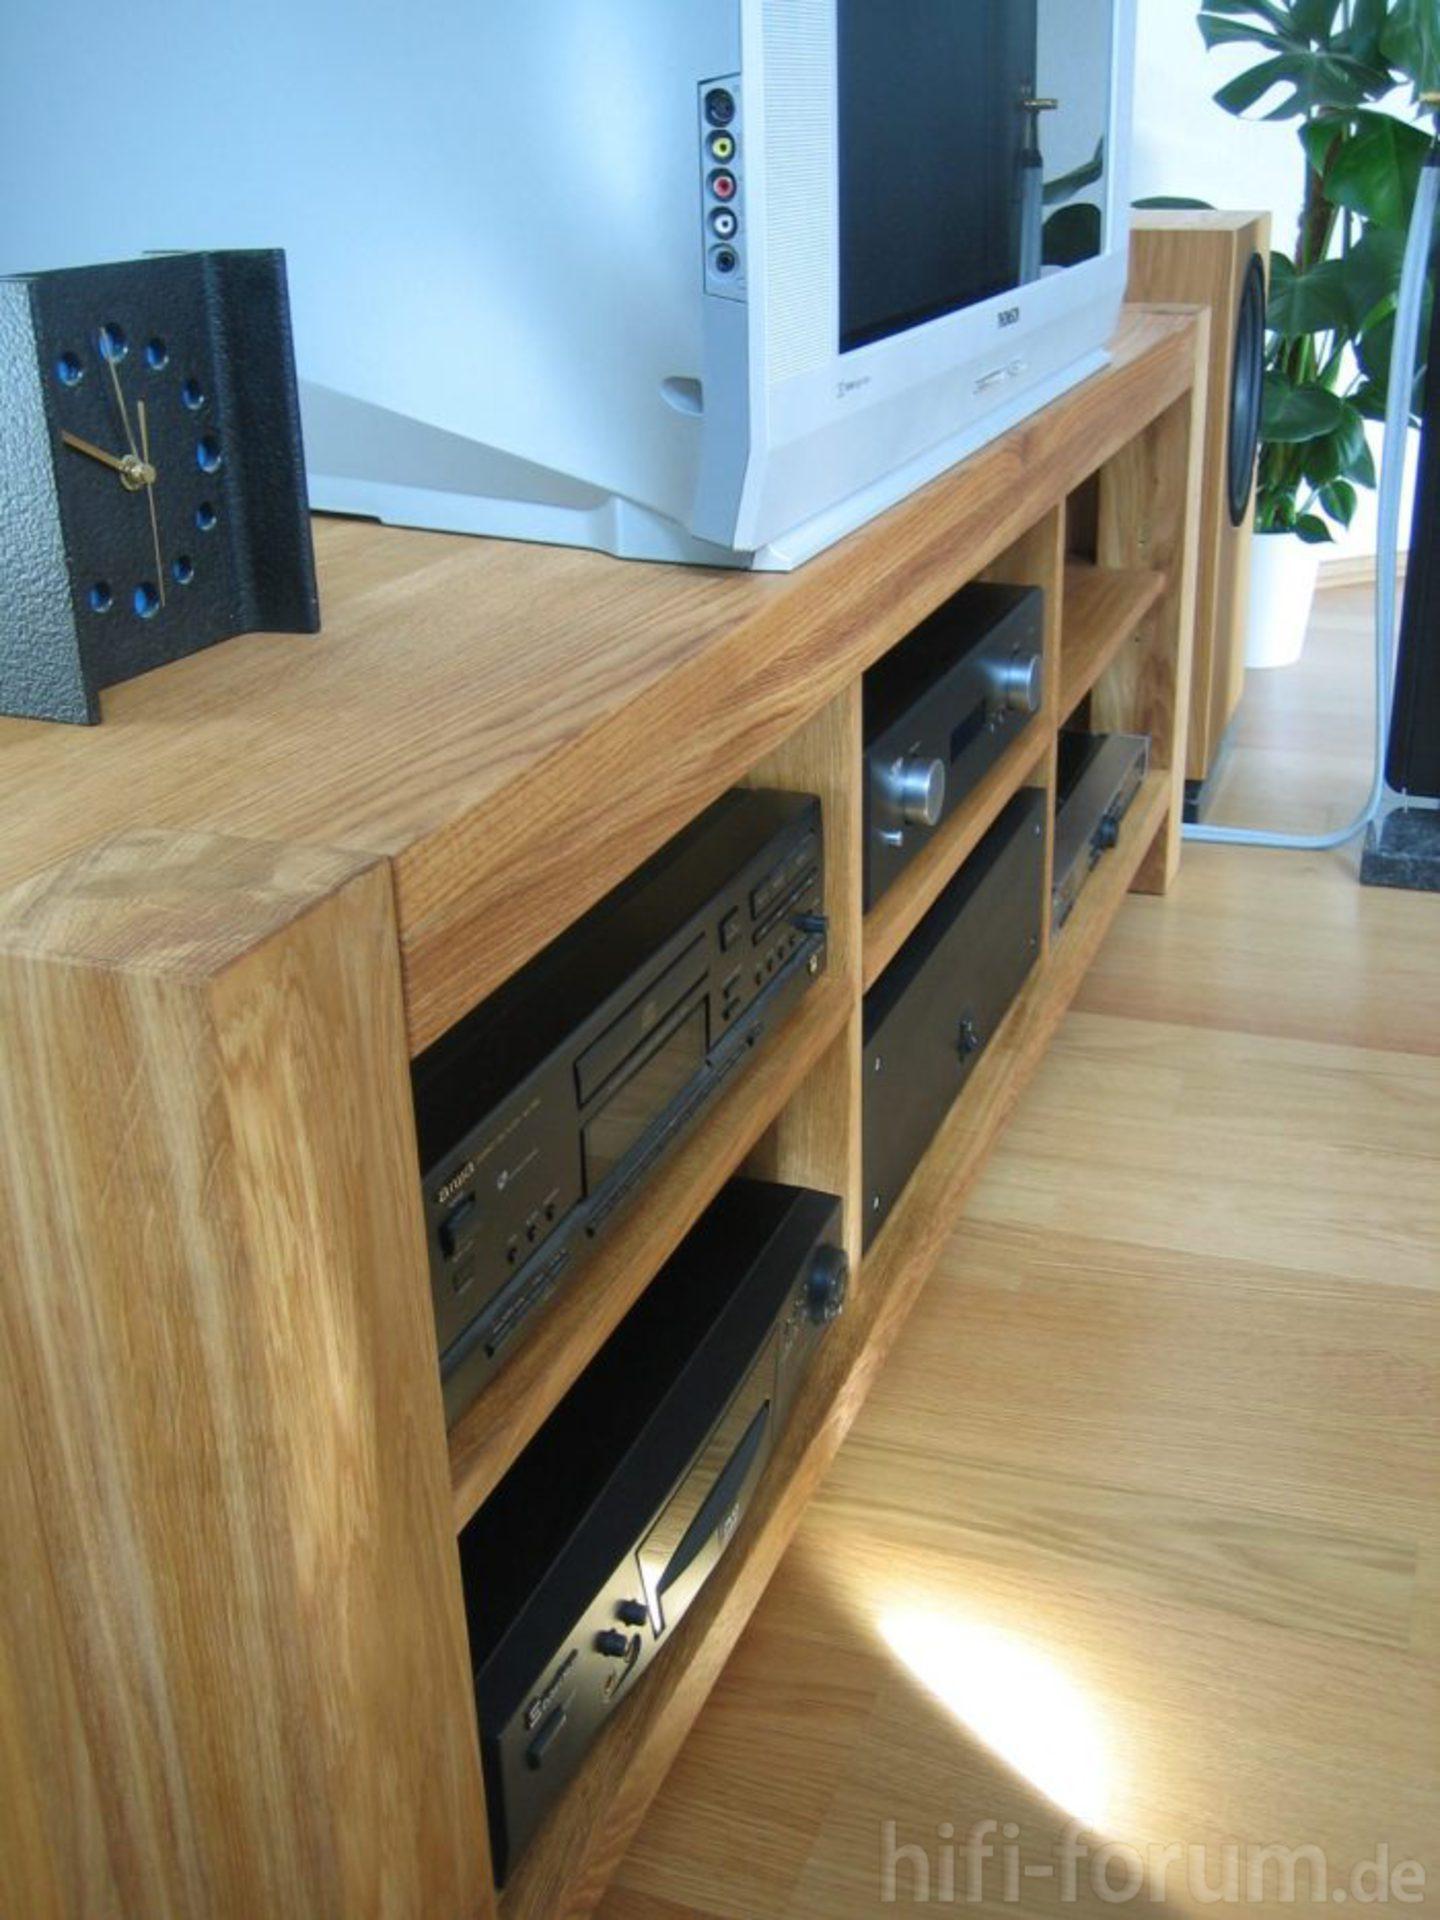 sideboard eiche echtholz do it yourself hifi bildergalerie. Black Bedroom Furniture Sets. Home Design Ideas